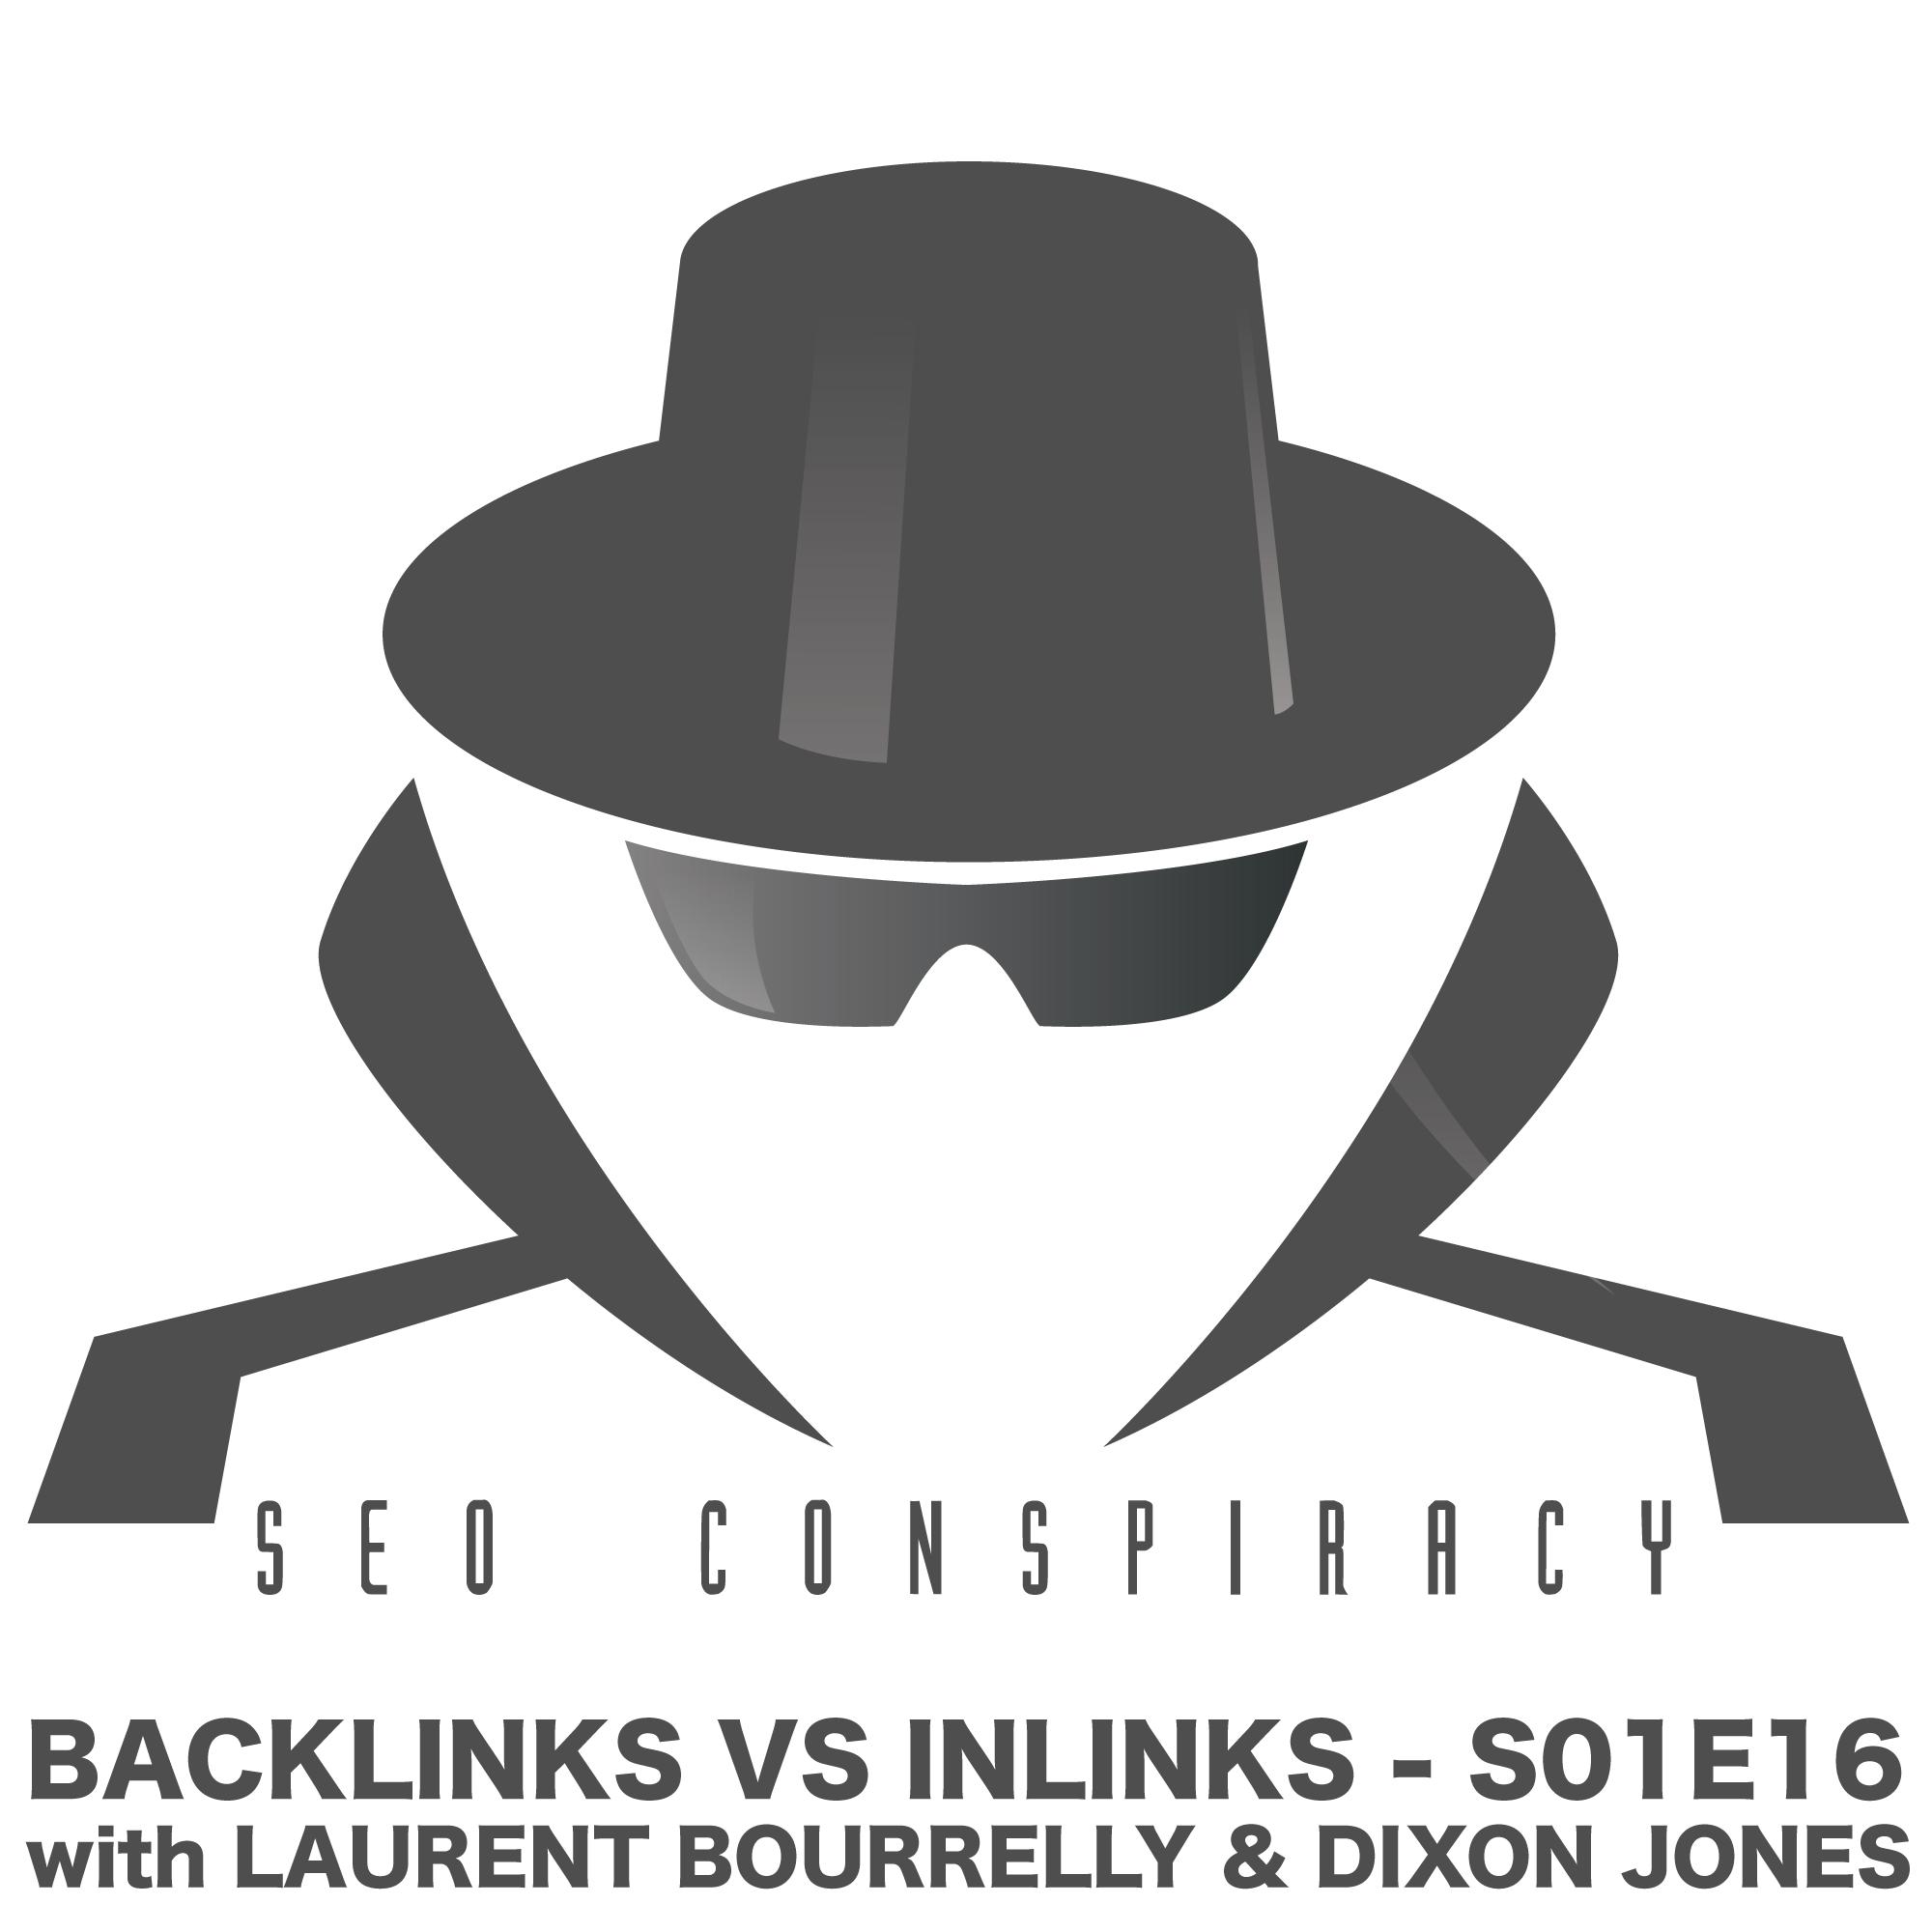 BACKLINKS VS. INLINKS AS RANKING FACTORS FOR ADVANCED SEO ON GOOGLE - SEO Conspiracy S01E16